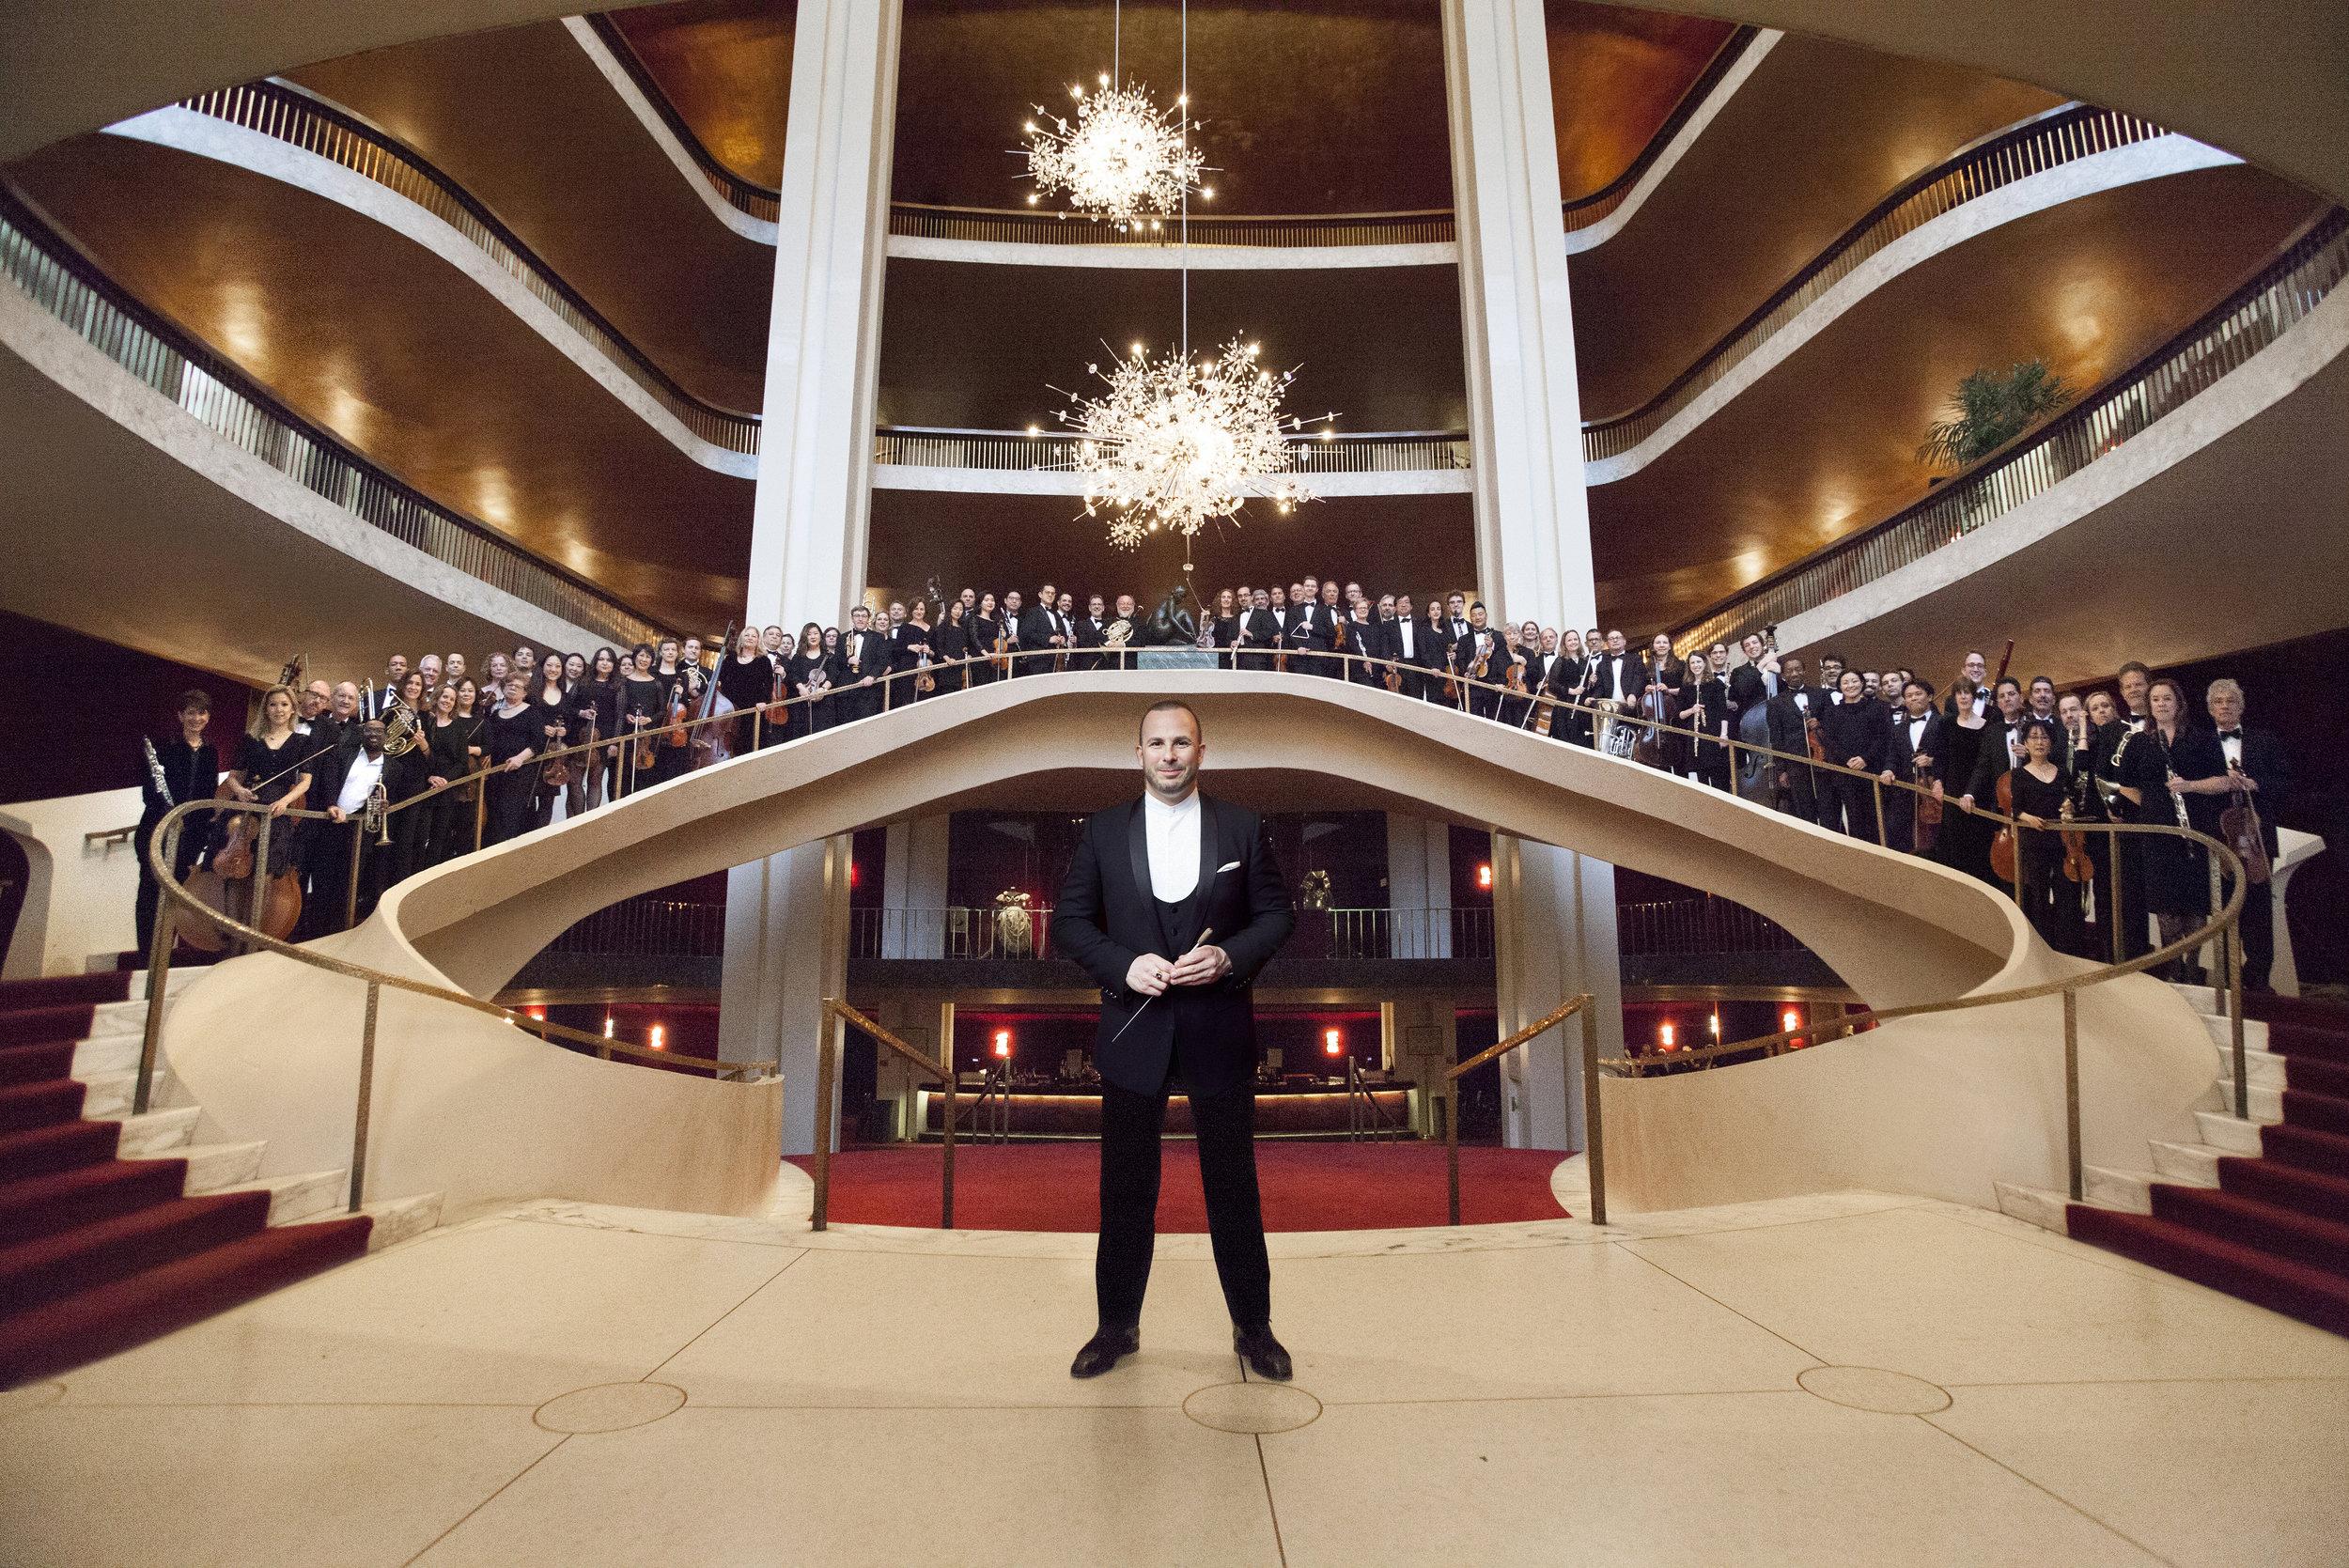 Yannick Nézet-Séguin with Metropolitan Opera Orchestra